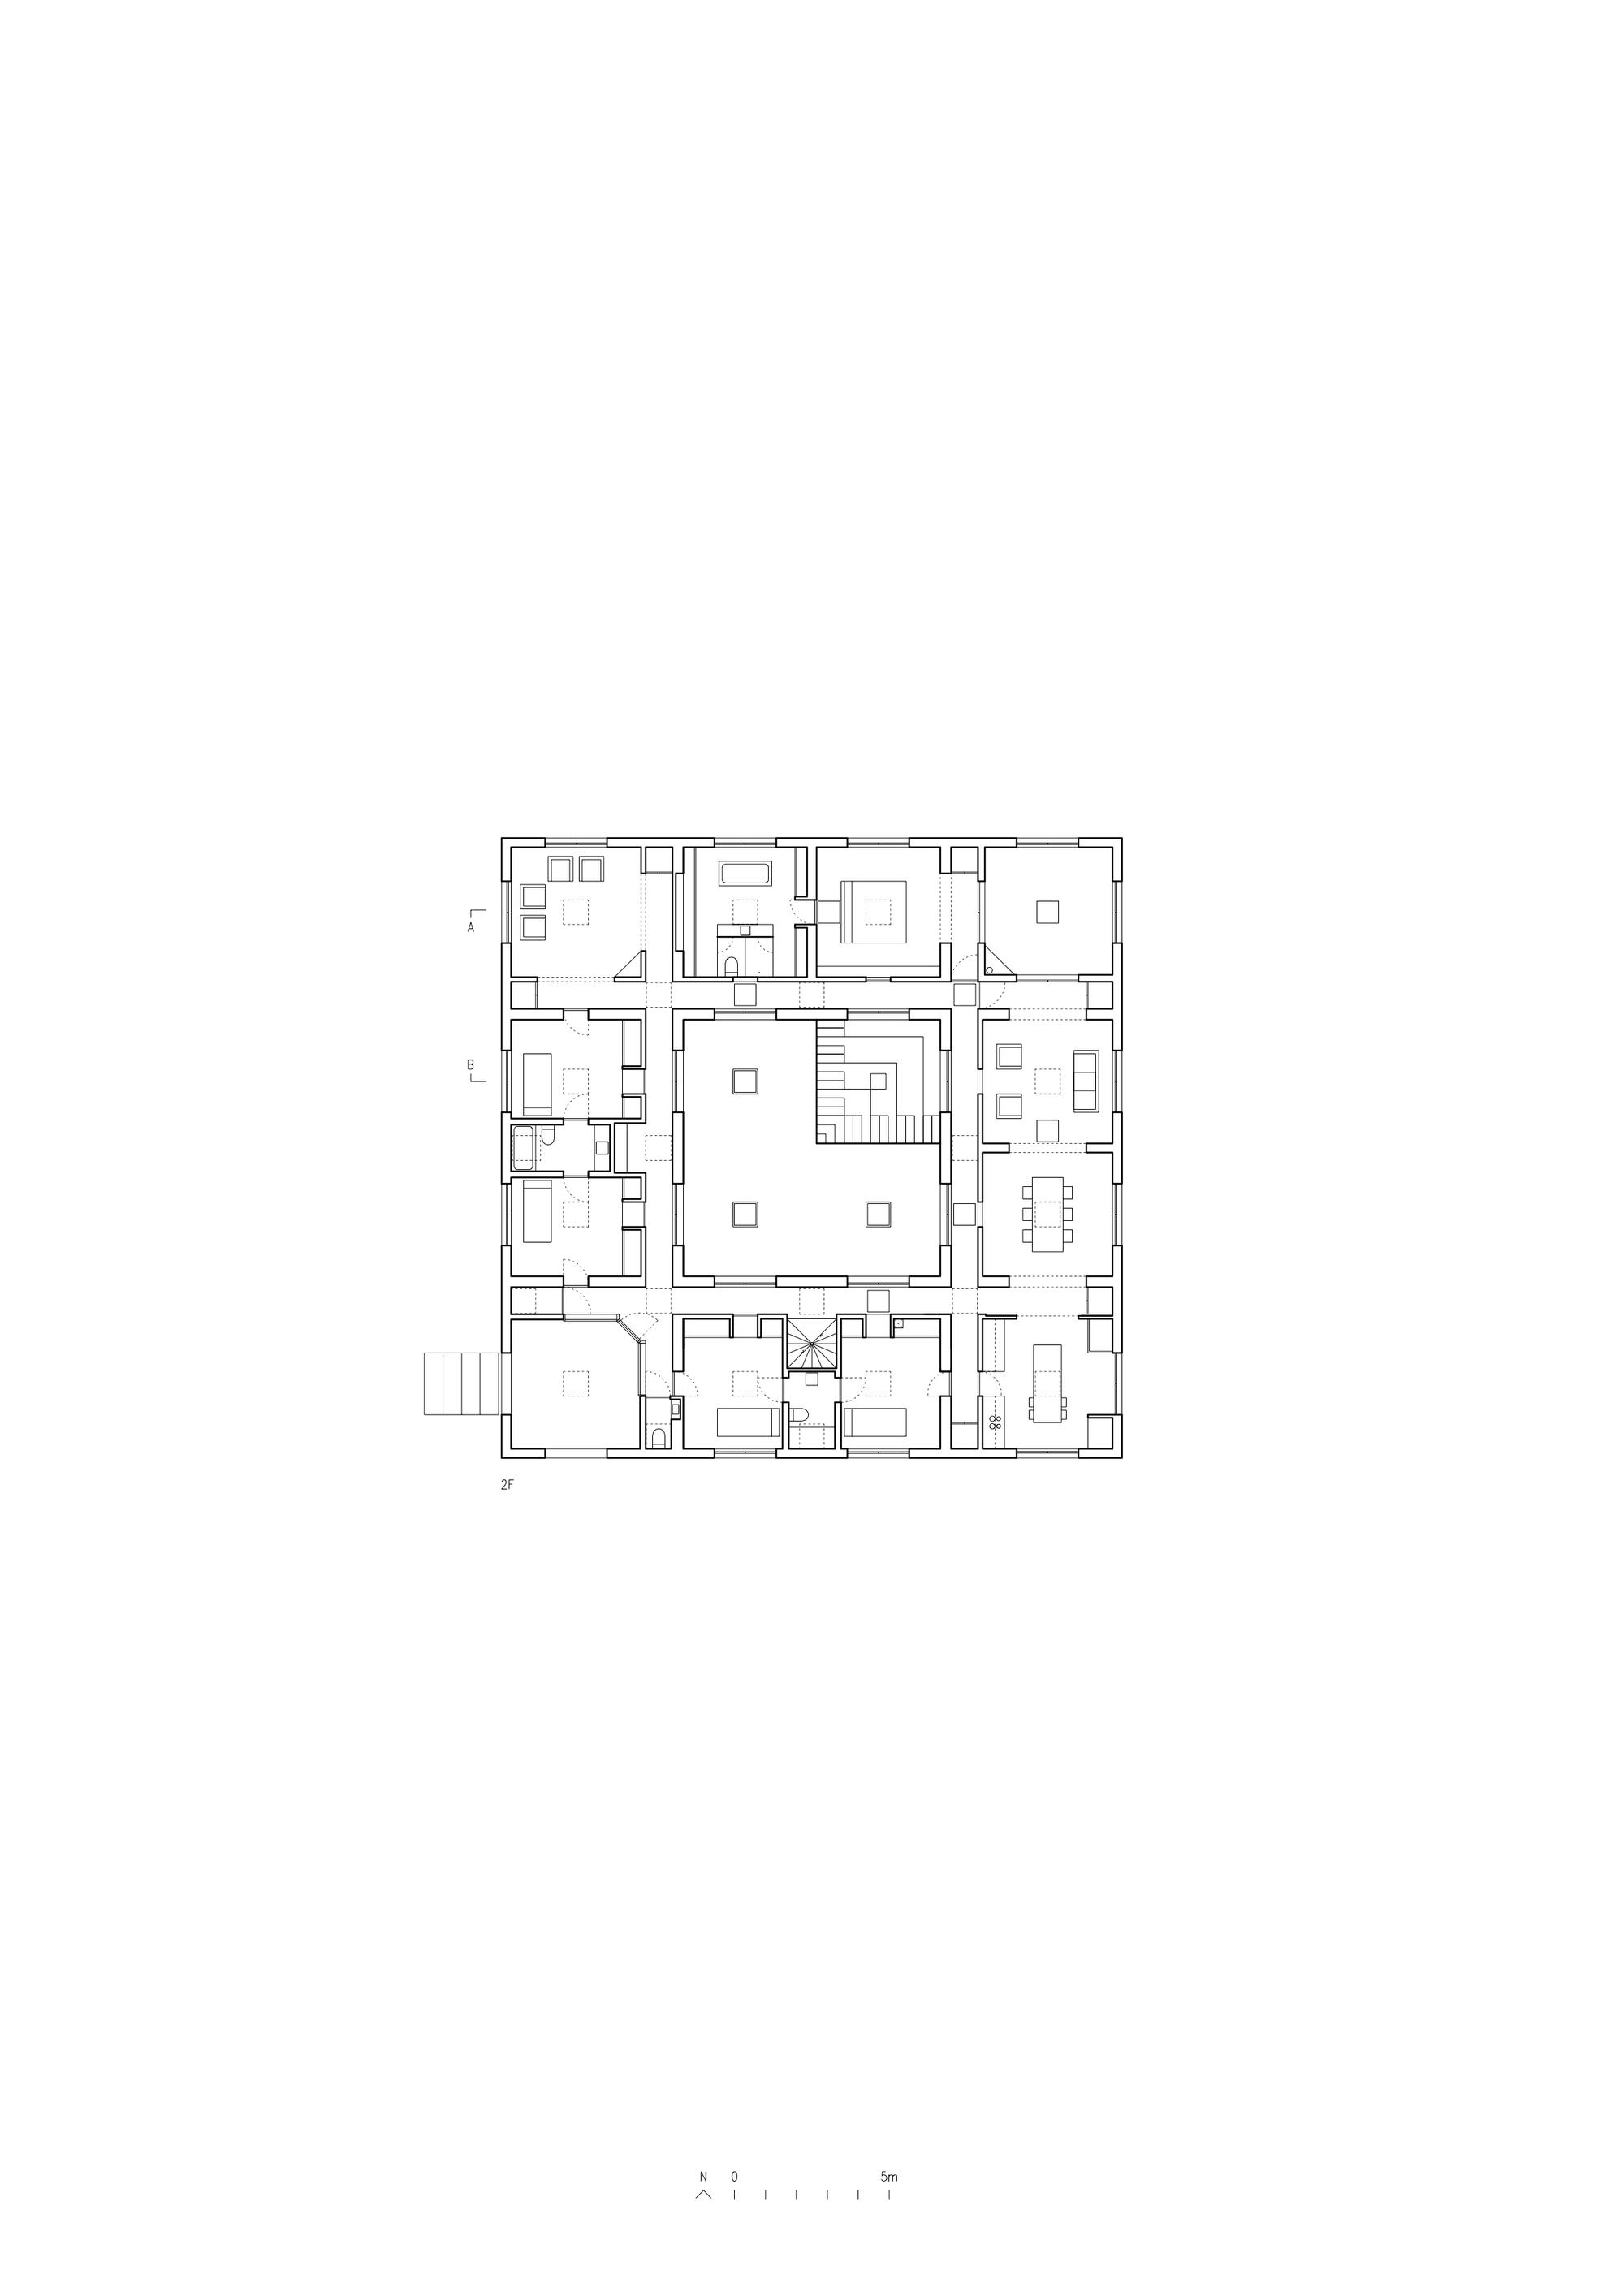 54aaf73ae58eceffe50000ba_guna-house-pezo-von-ellrichshausen_pve_guna_04_plan_02